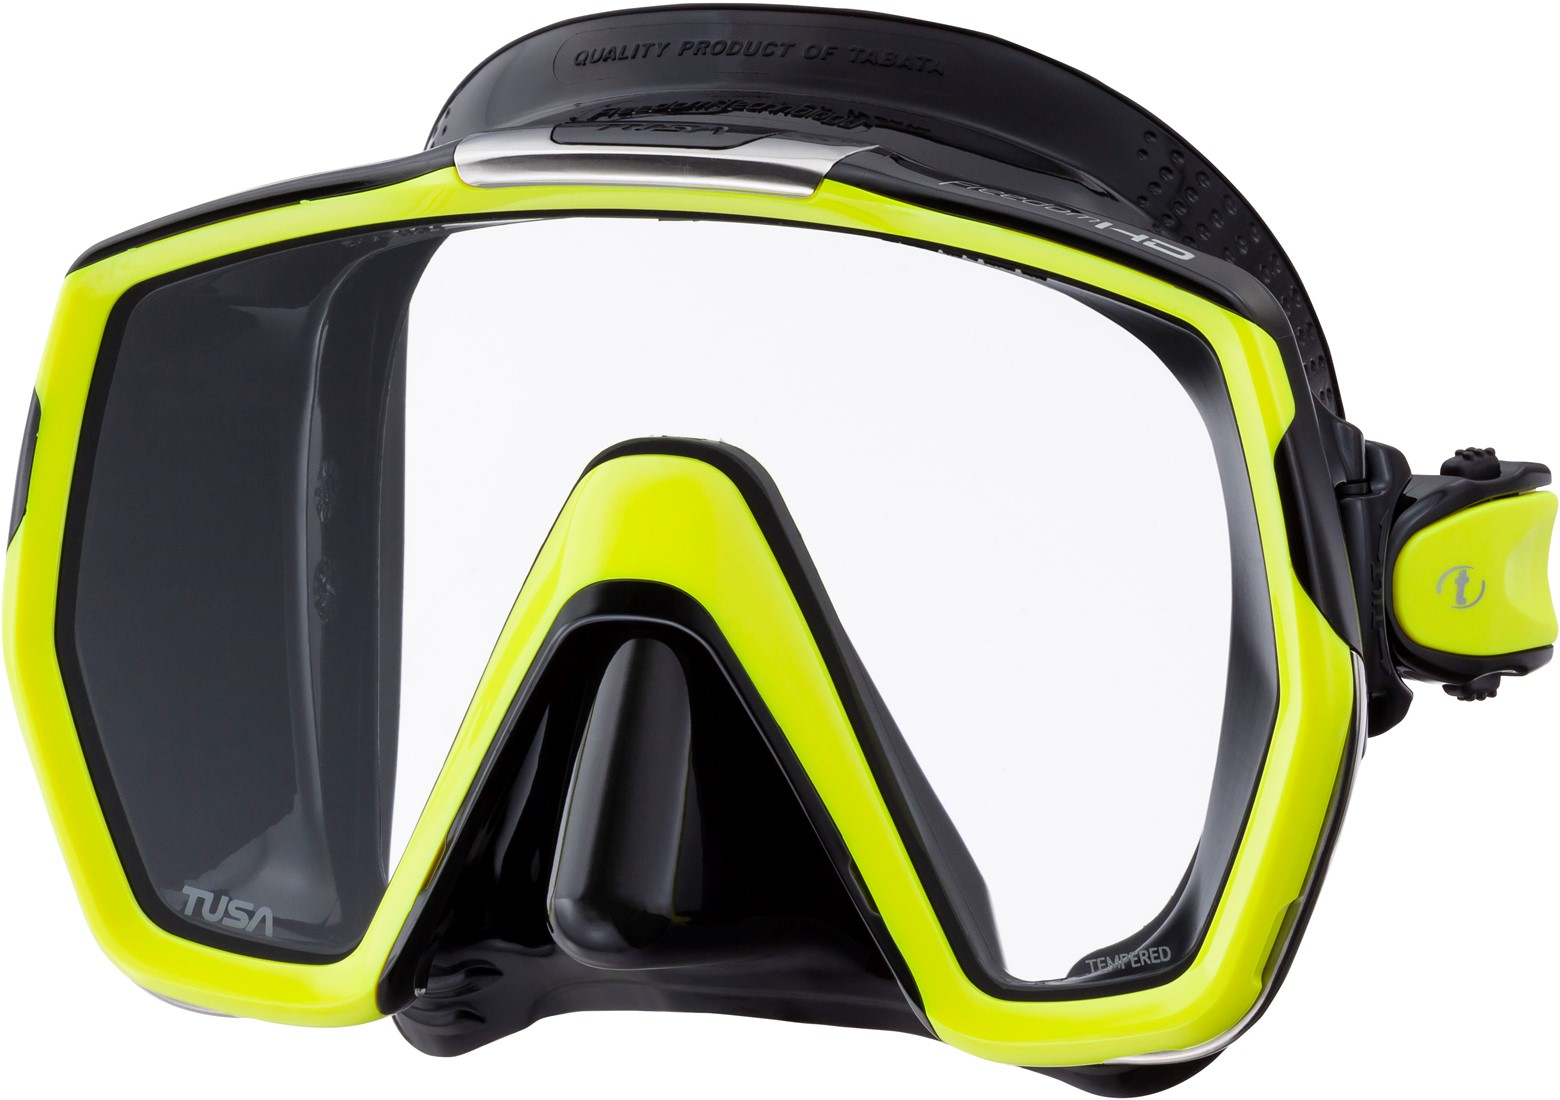 4f6bdbd8f1d668 Tusa M1001Qb Fy Freedom Hd duikbril bij SubLub